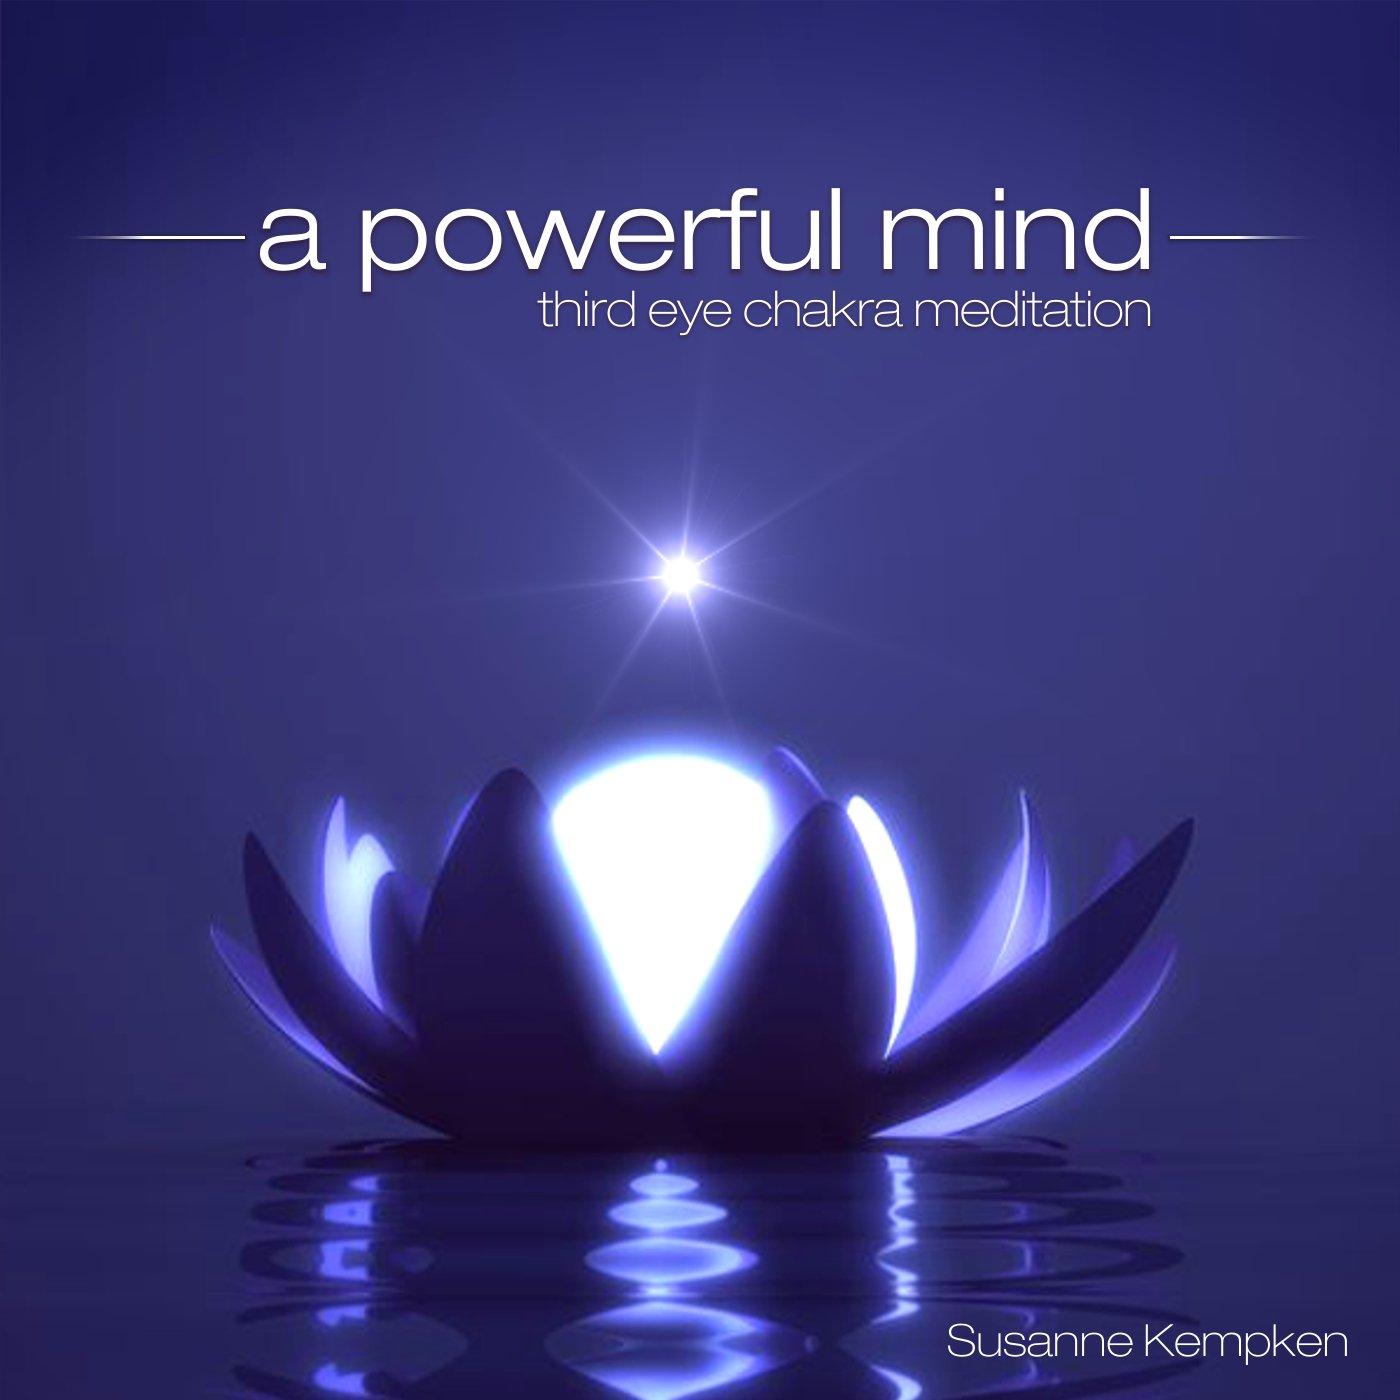 A Powerful Mind - Third Eye Chakra Meditation By Susanne Kempken